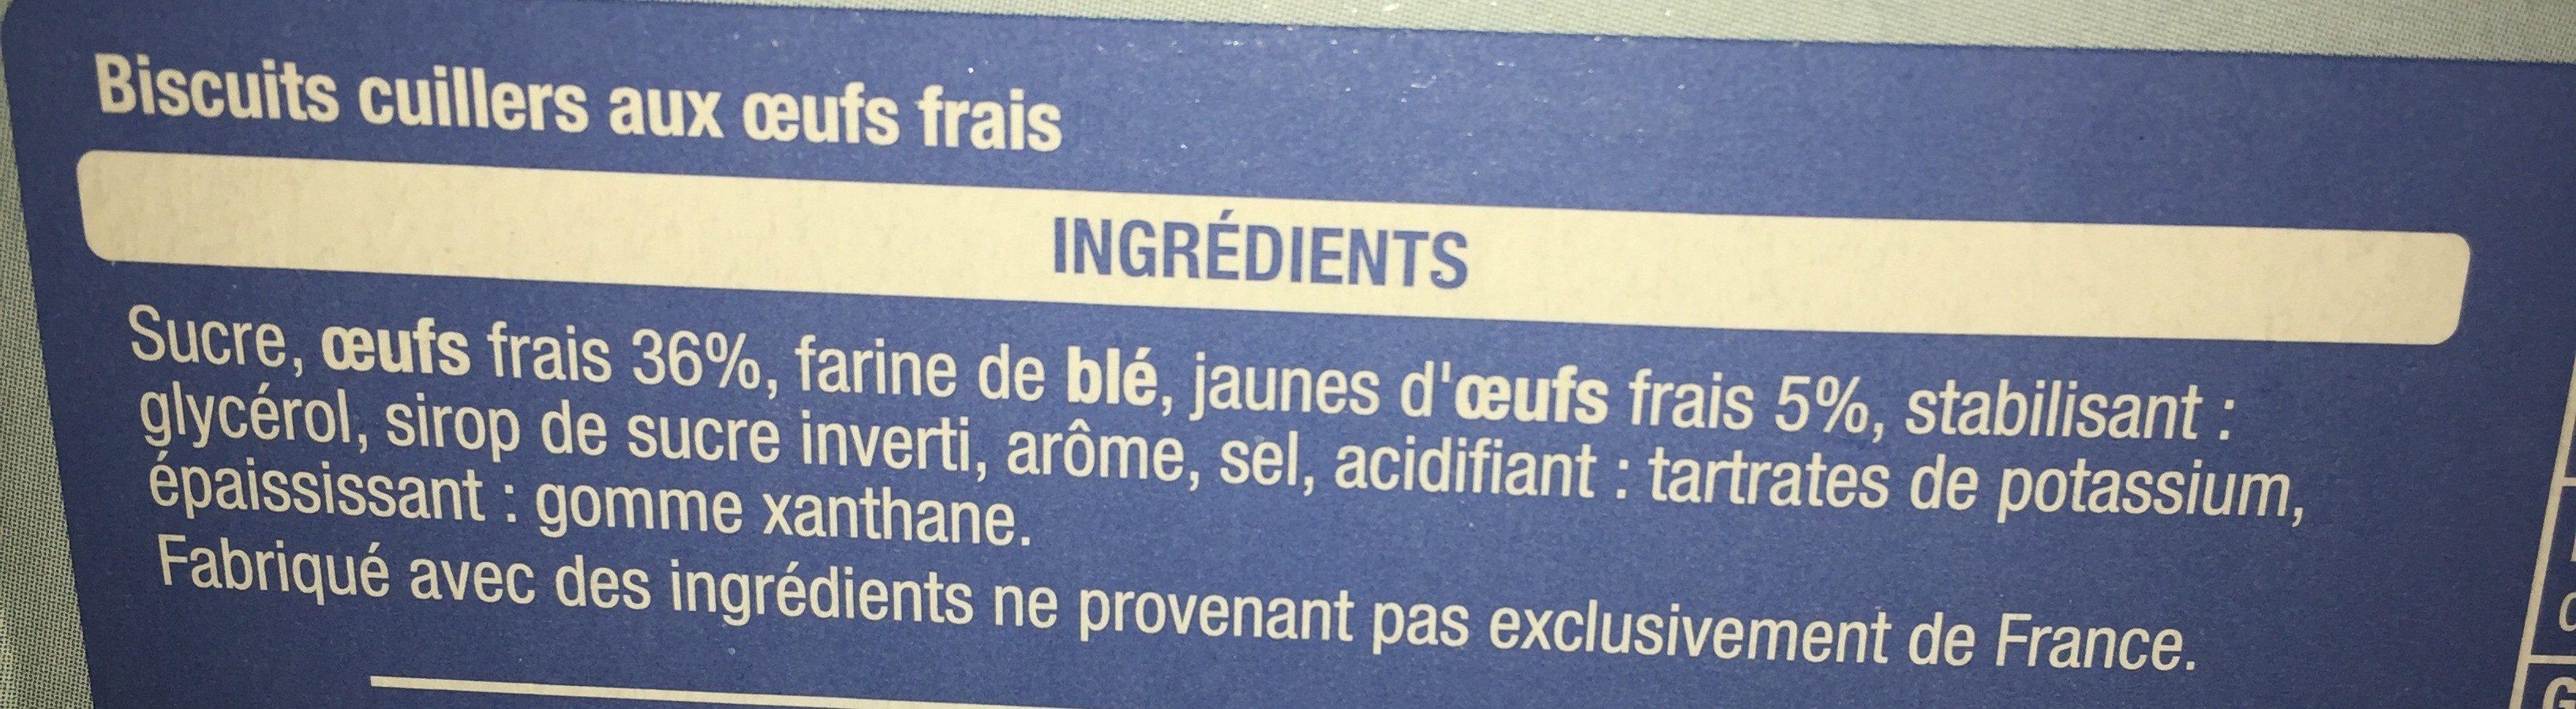 Biscuits cuillers degustation x15 - Ingrédients